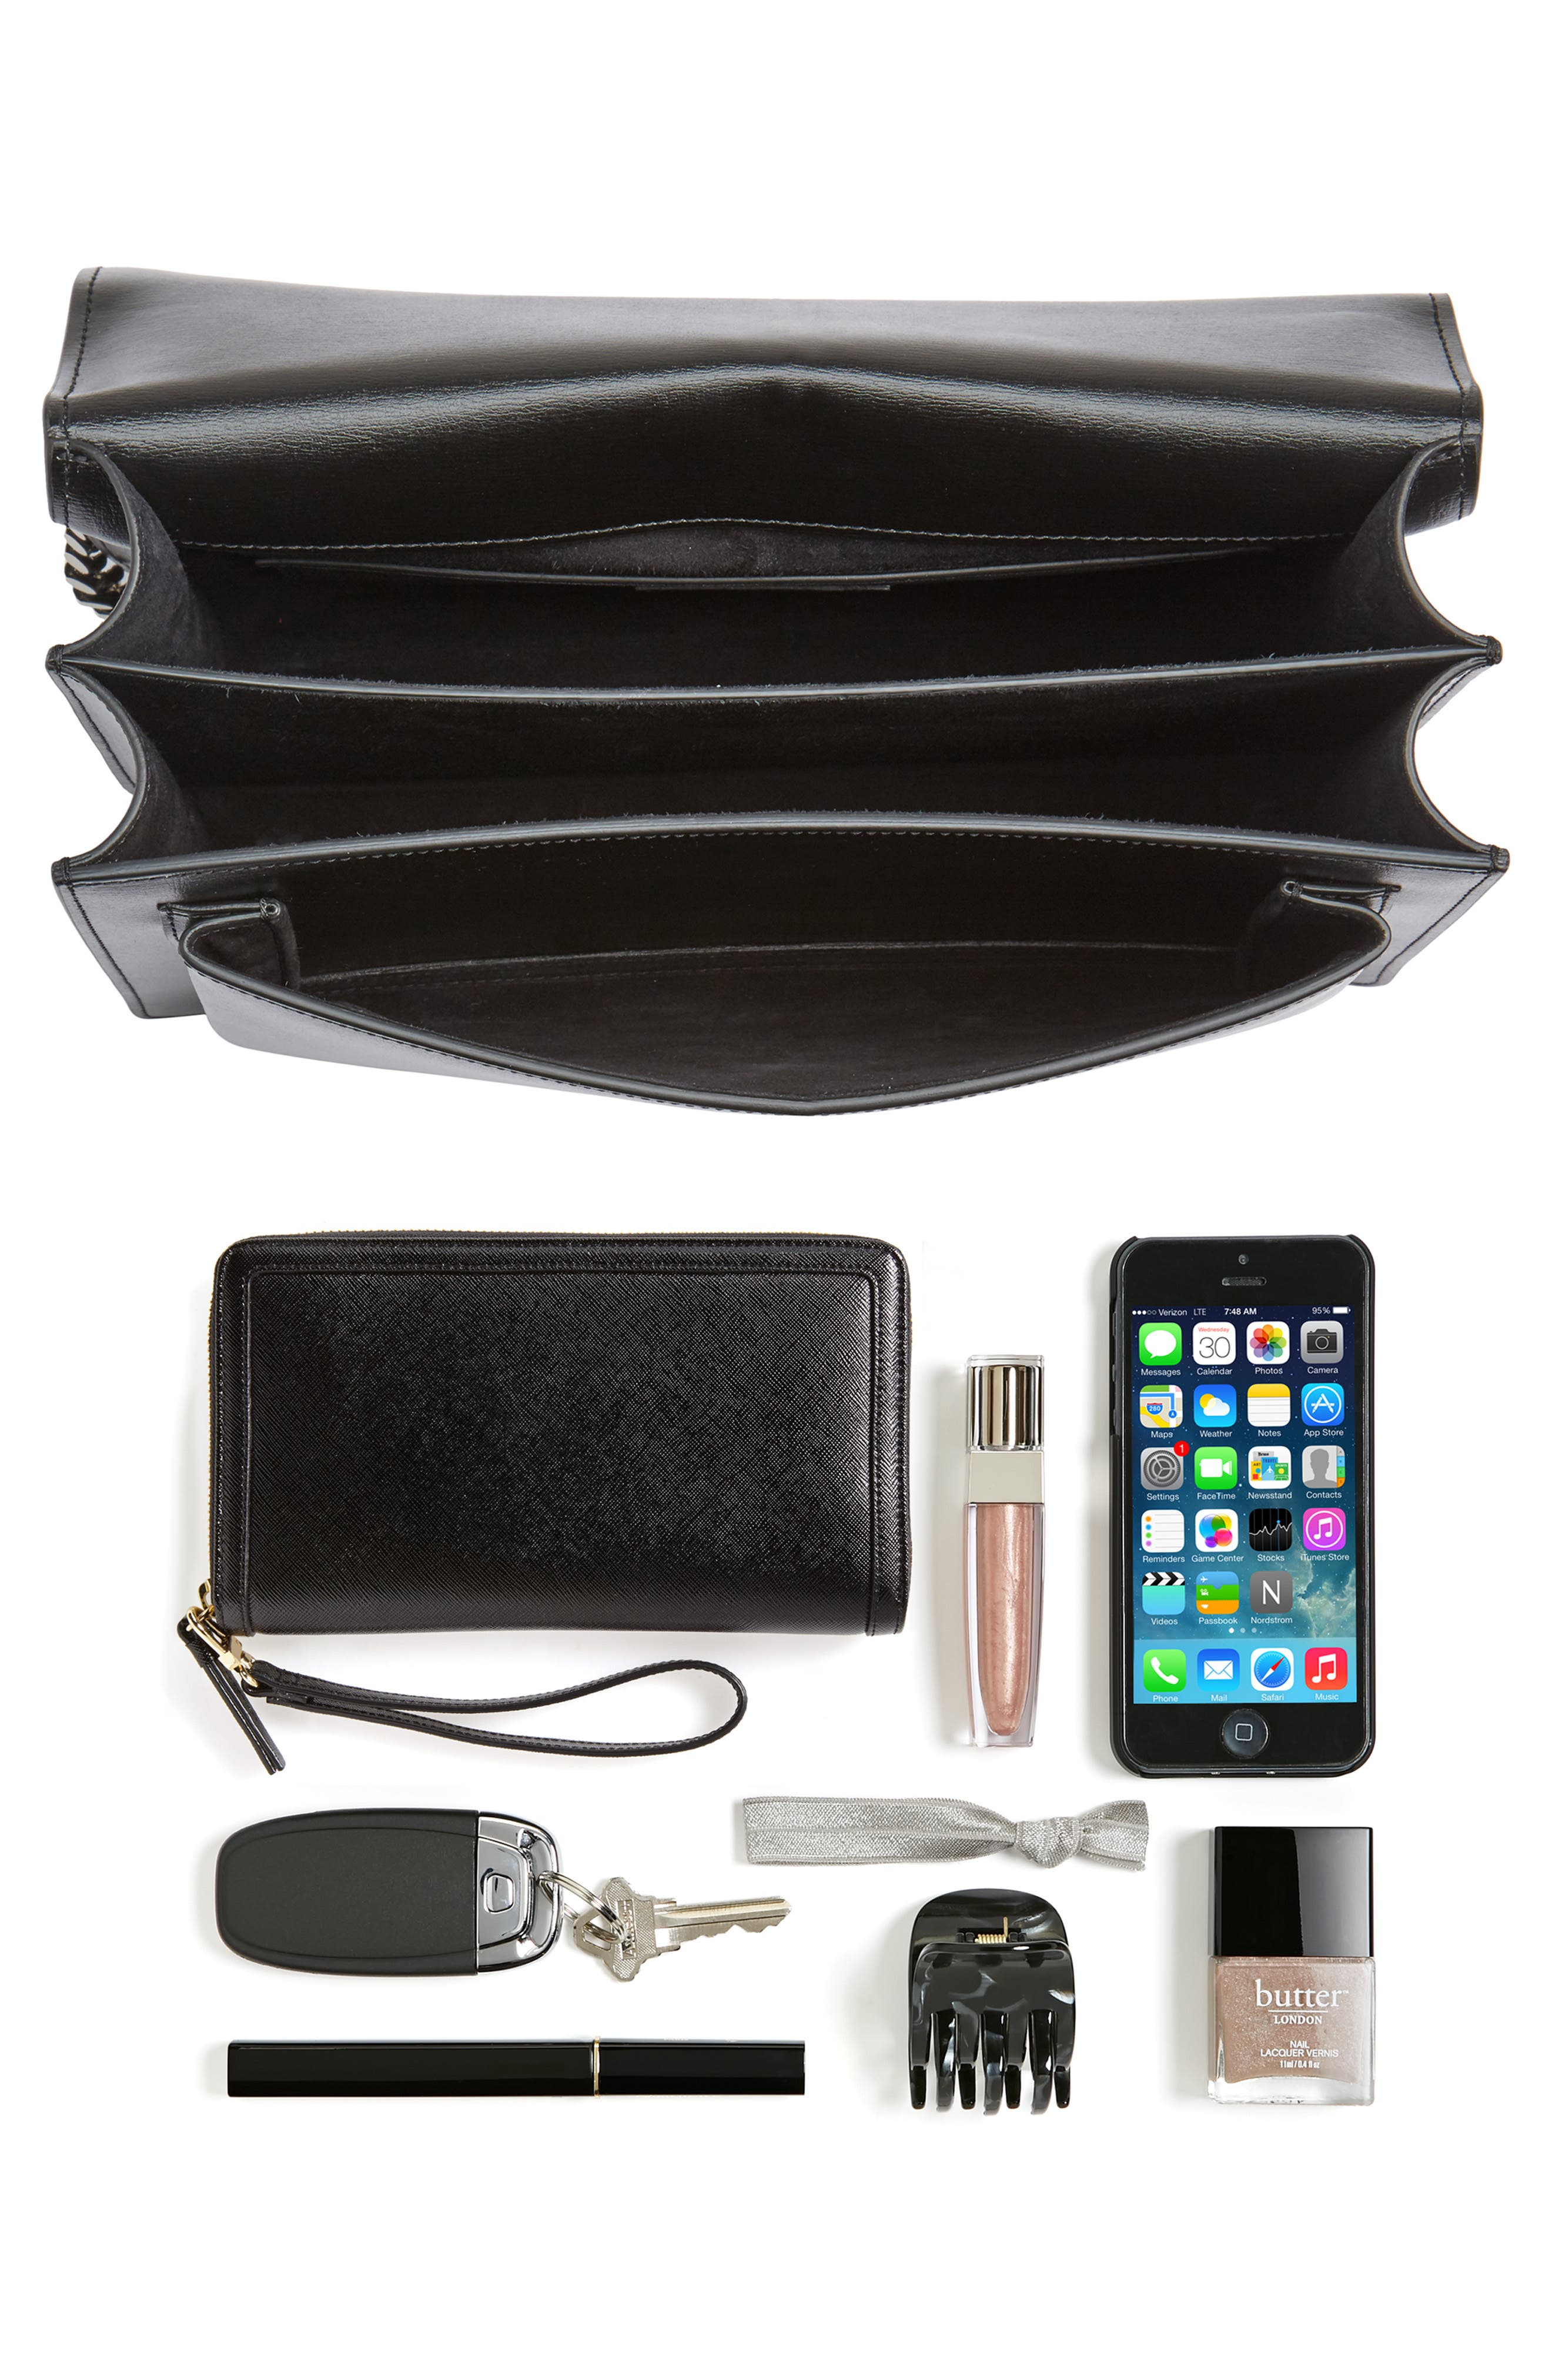 Medium Sunset Leather Shoulder Bag,                             Alternate thumbnail 7, color,                             NOIR